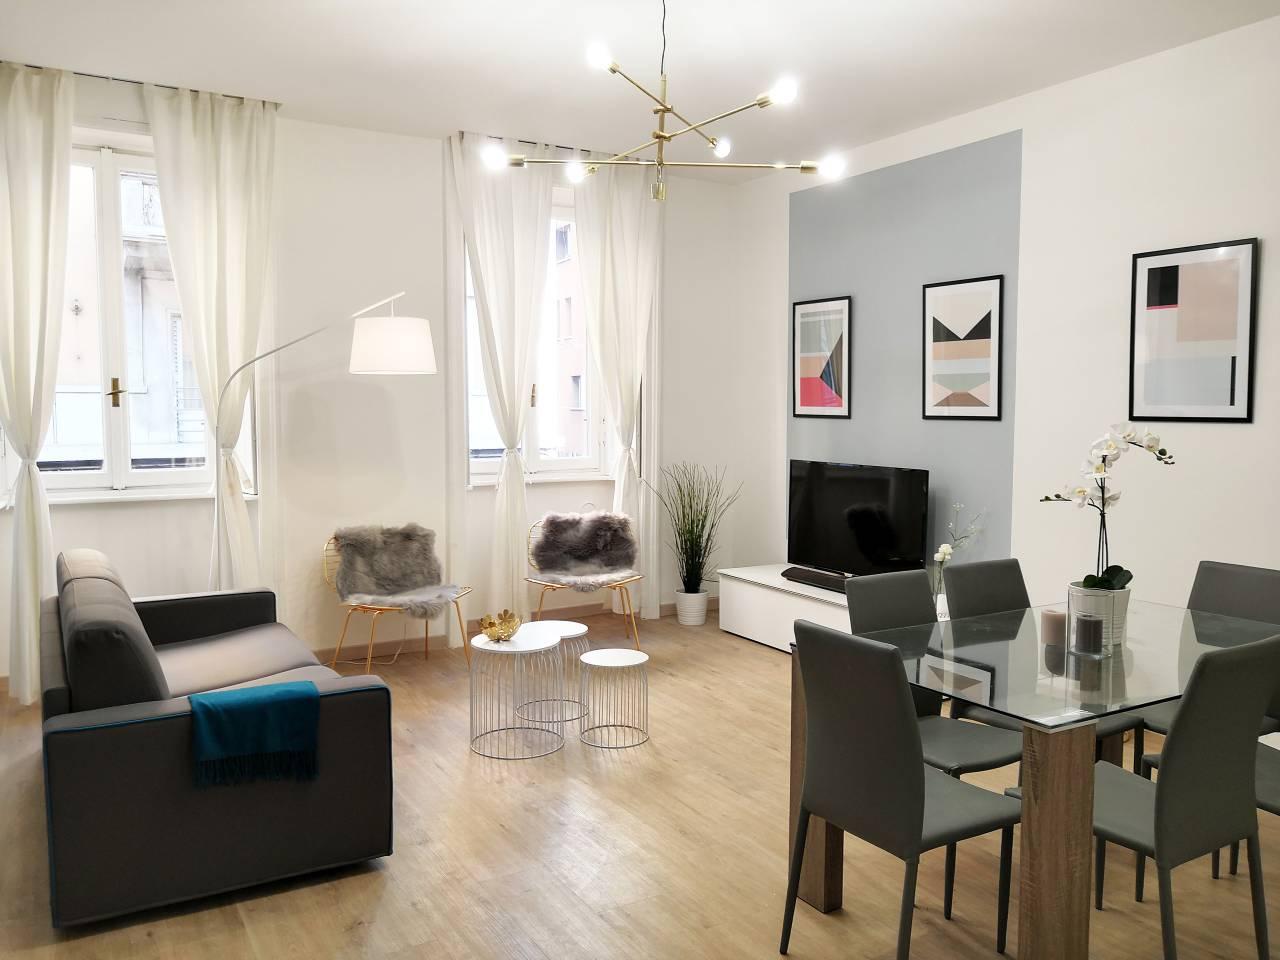 Apartment Hintown Austere Elegance 2 photo 18404017